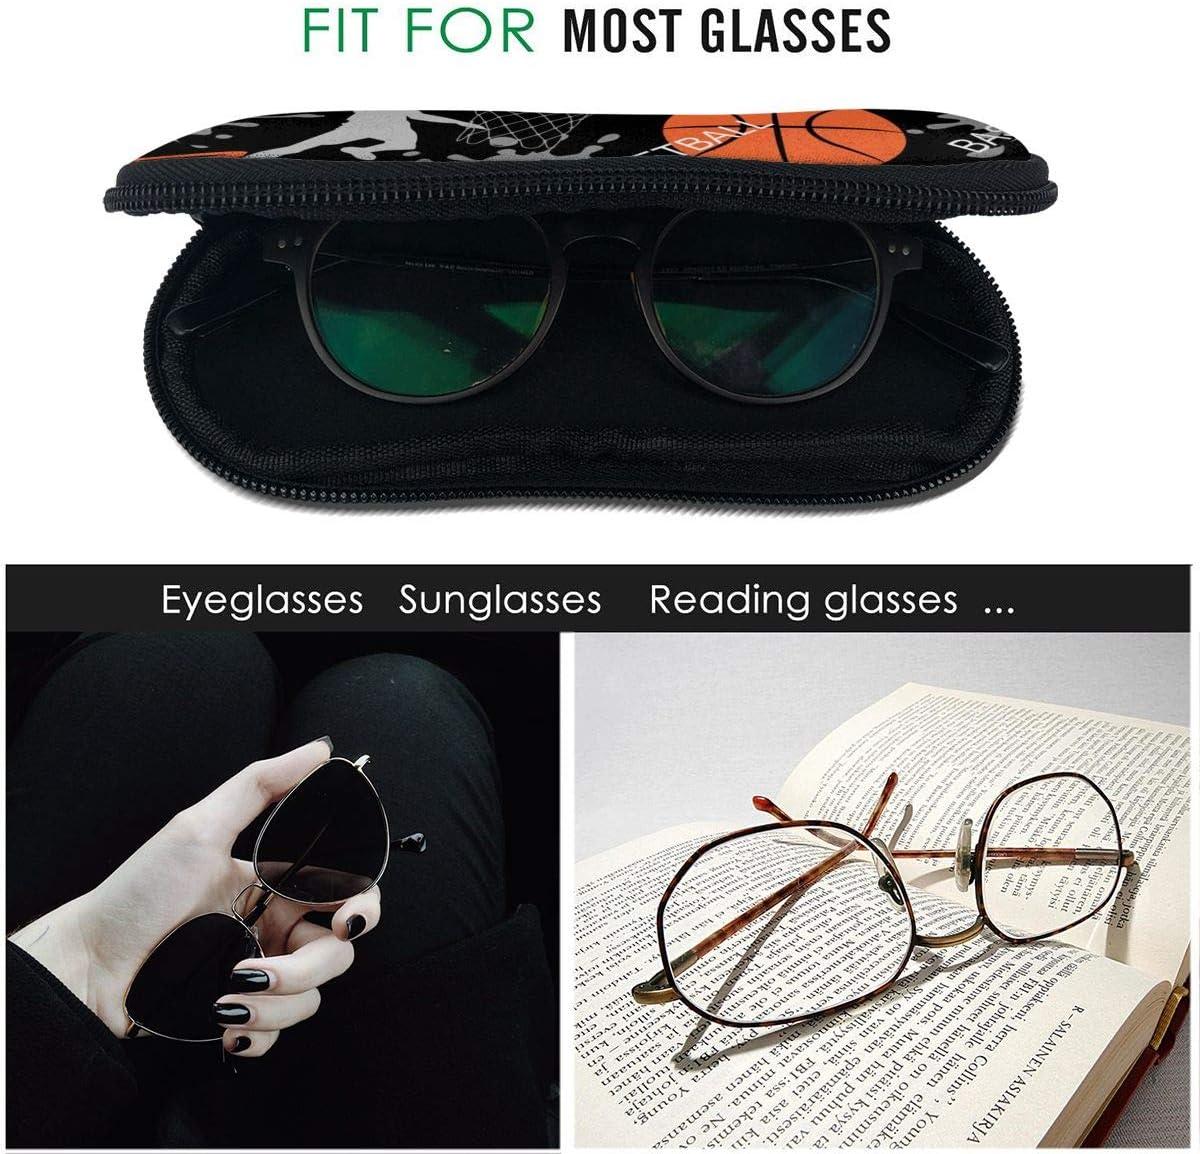 Ultra Light Portable Zipper Sunglasses Glasses Case CHOKRA Sylized Octopus Soft Neoprene Eyeglasses Case with Carabiner